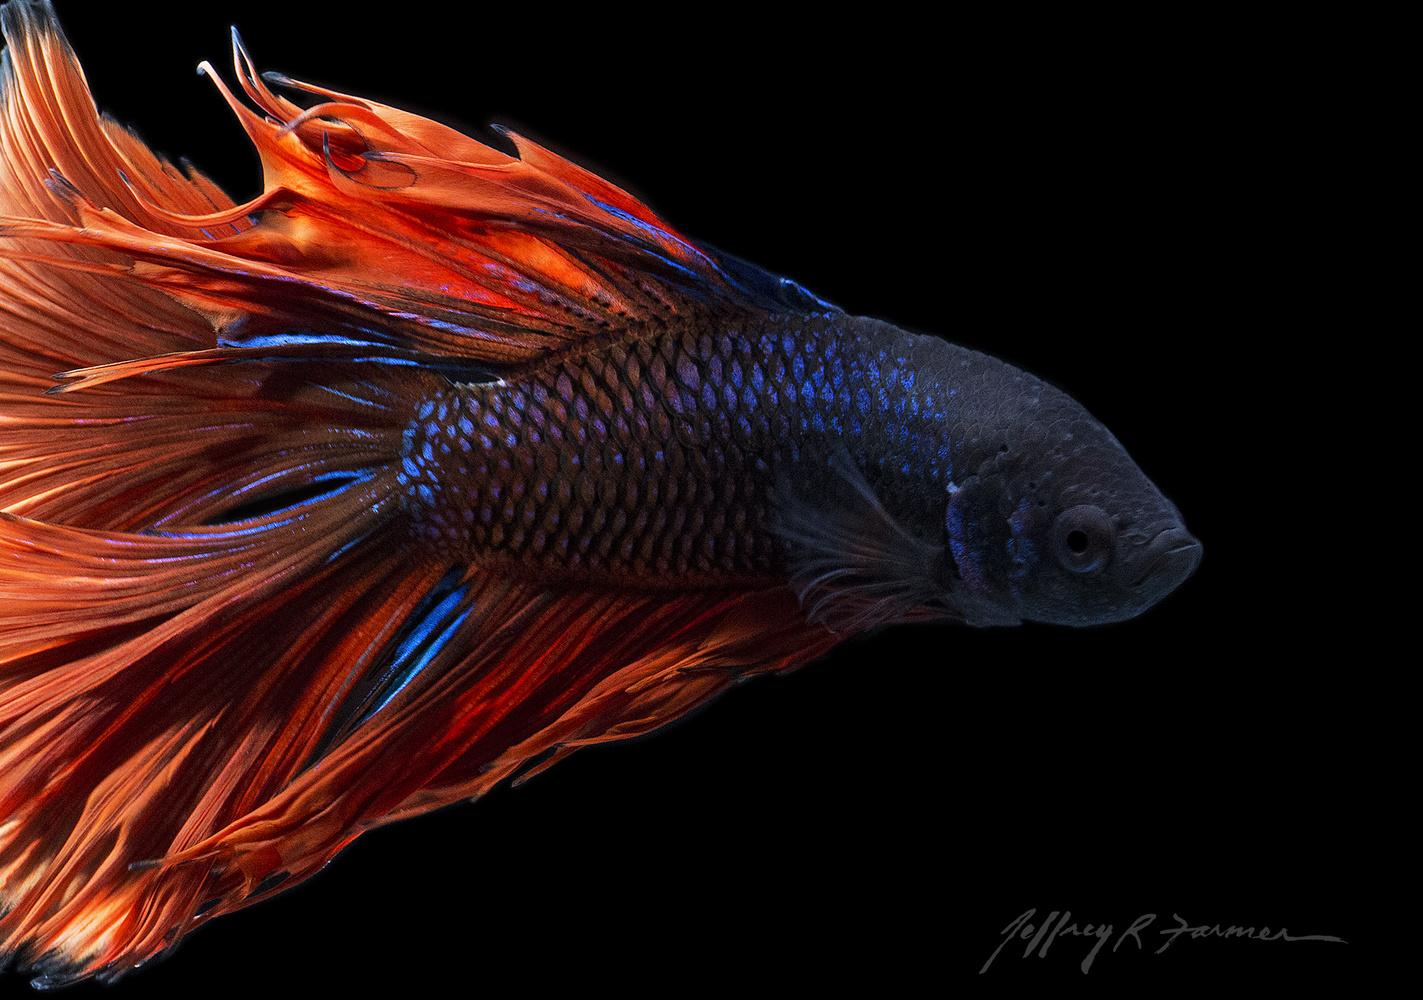 """Fish on Fire"" by Jeffrey R Farmer"